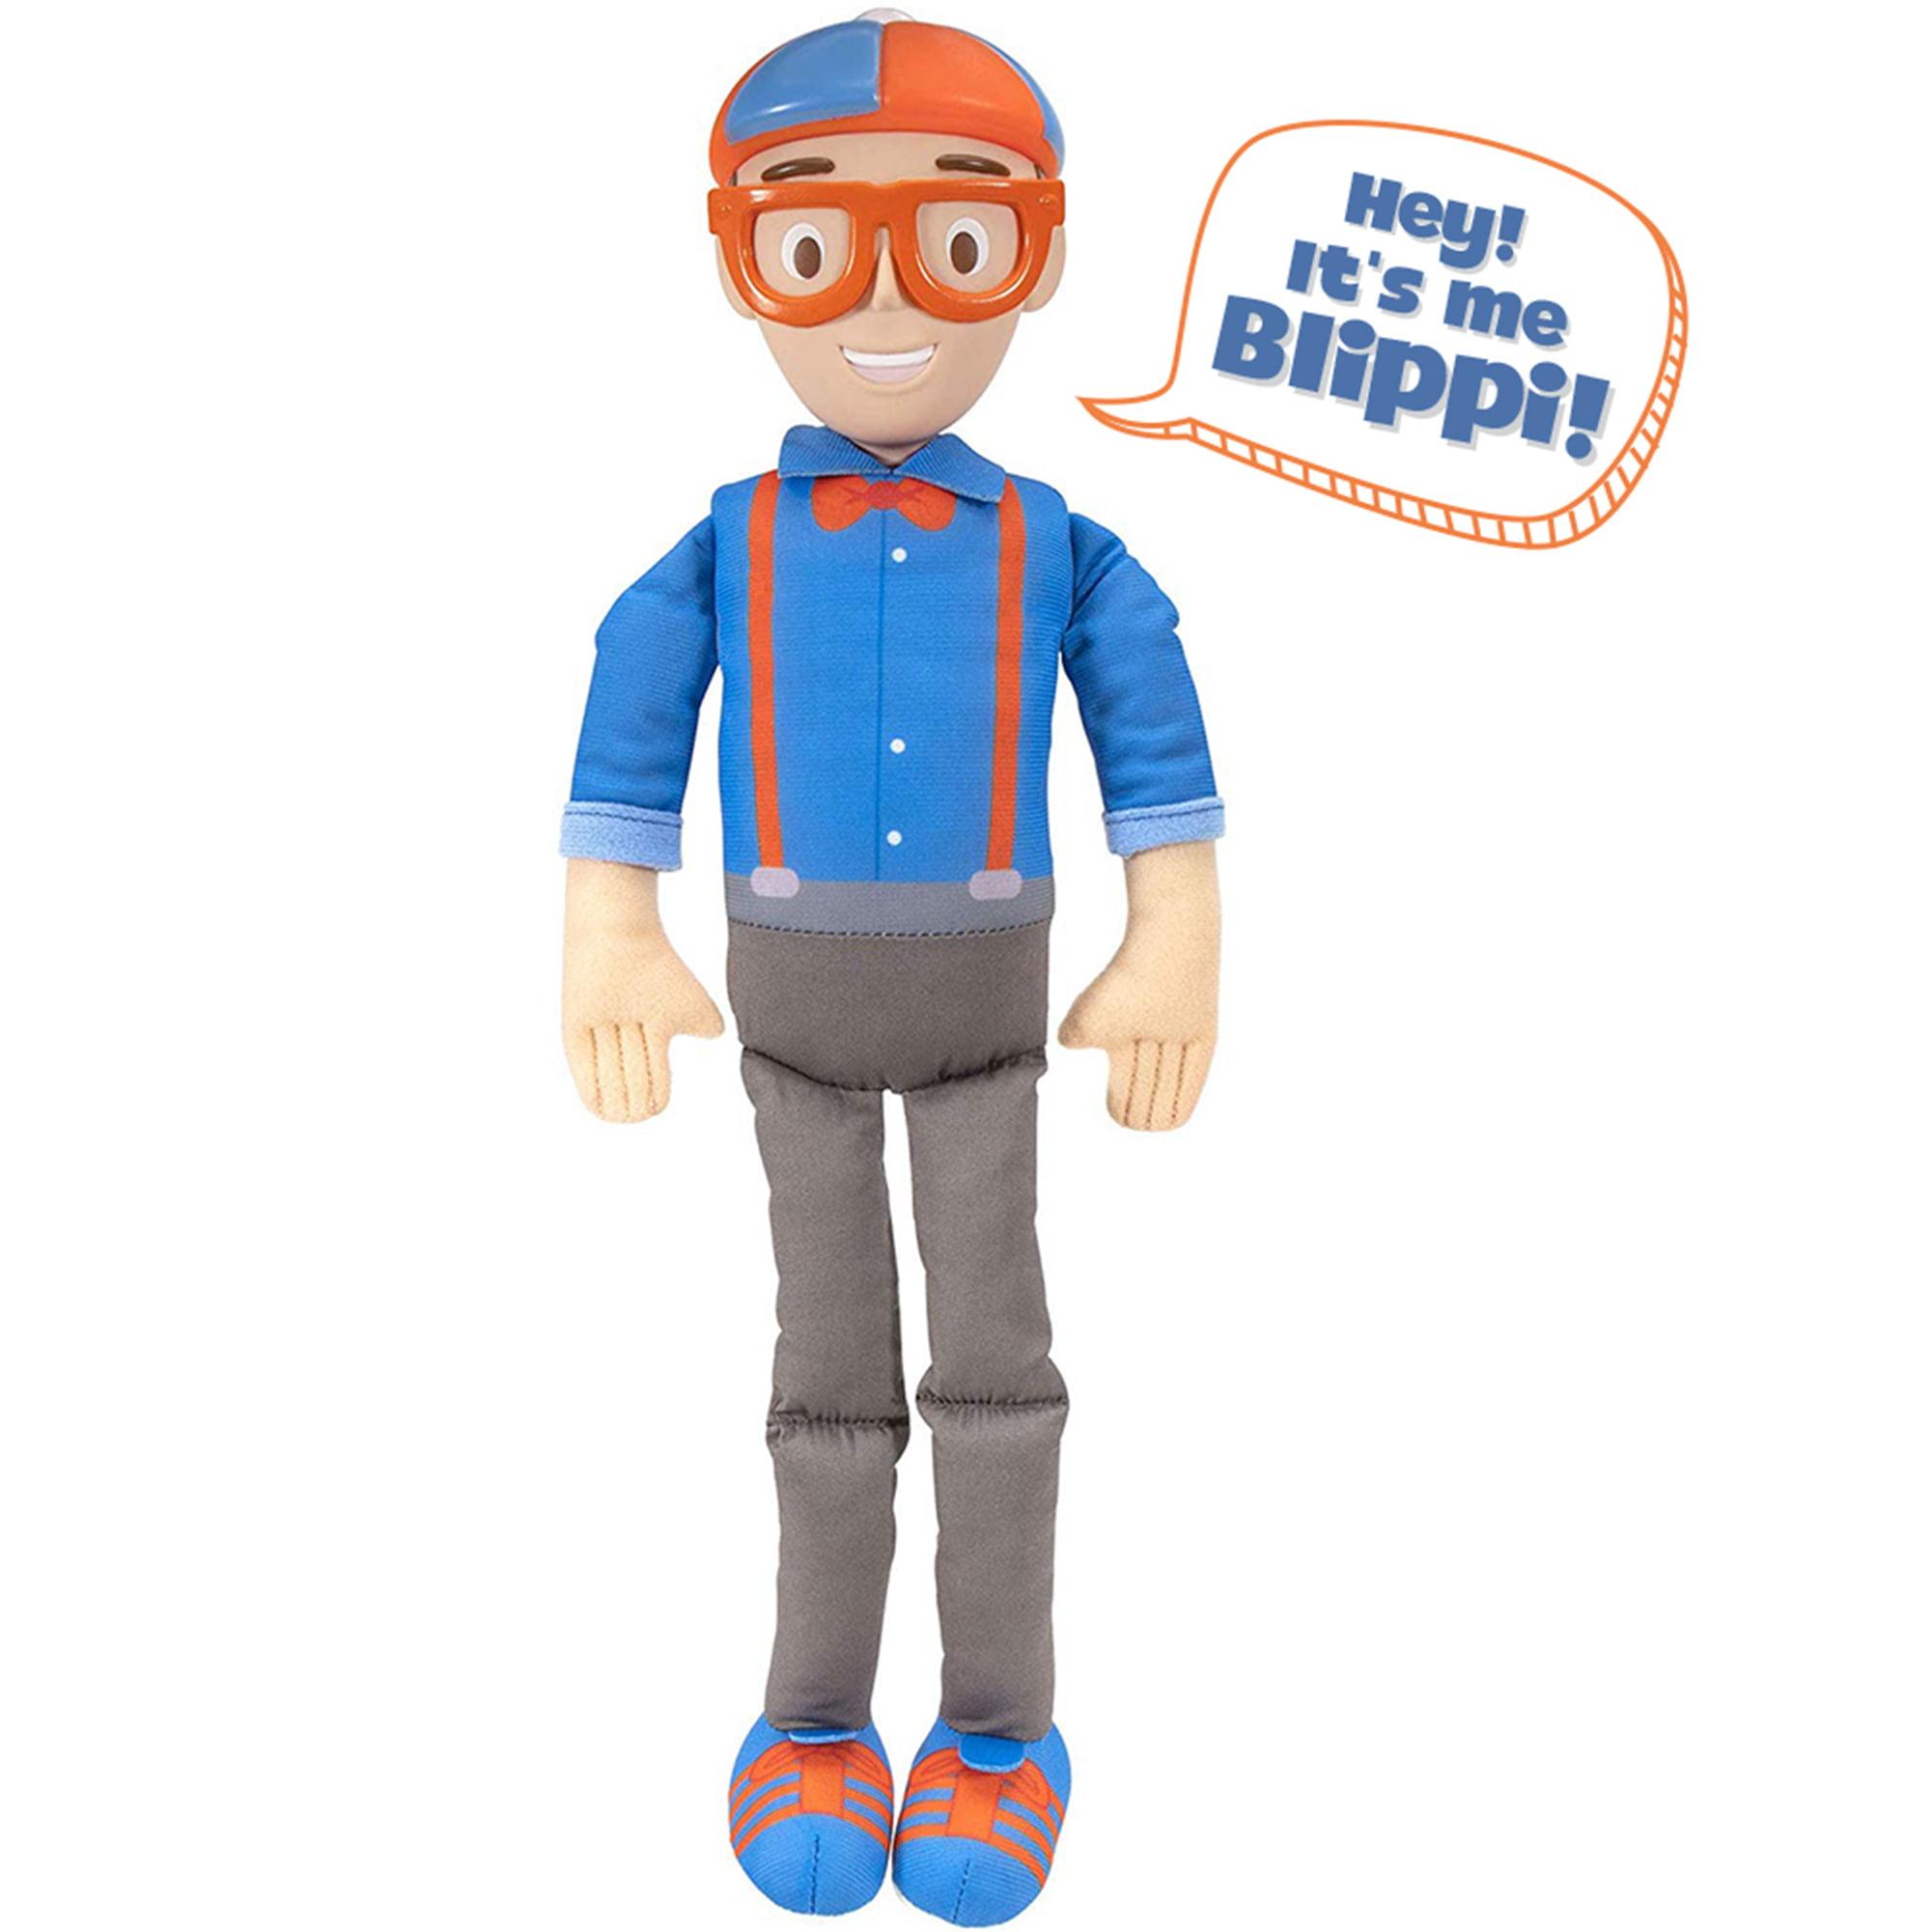 BLIPPI-MY BUDDY BLIPPI Parlant Jouet Doux En Peluche 40 cm poupée 15 sons phrases New